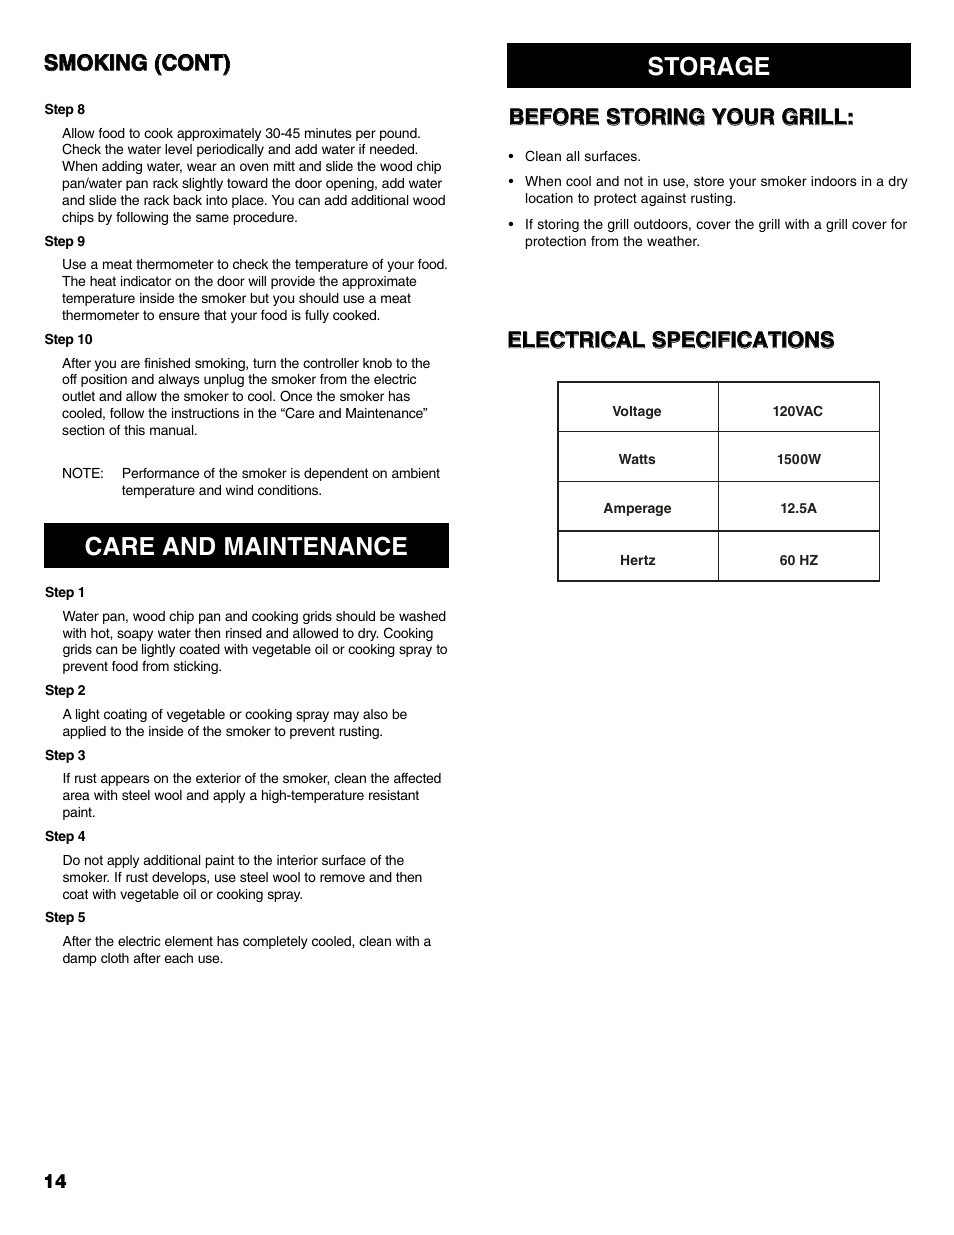 care and maintenance storage kenmore 125 15885800 user manual rh manualsdir com Brinkmann Electric Smoker Brinkmann Smoker Cooking Time Chart